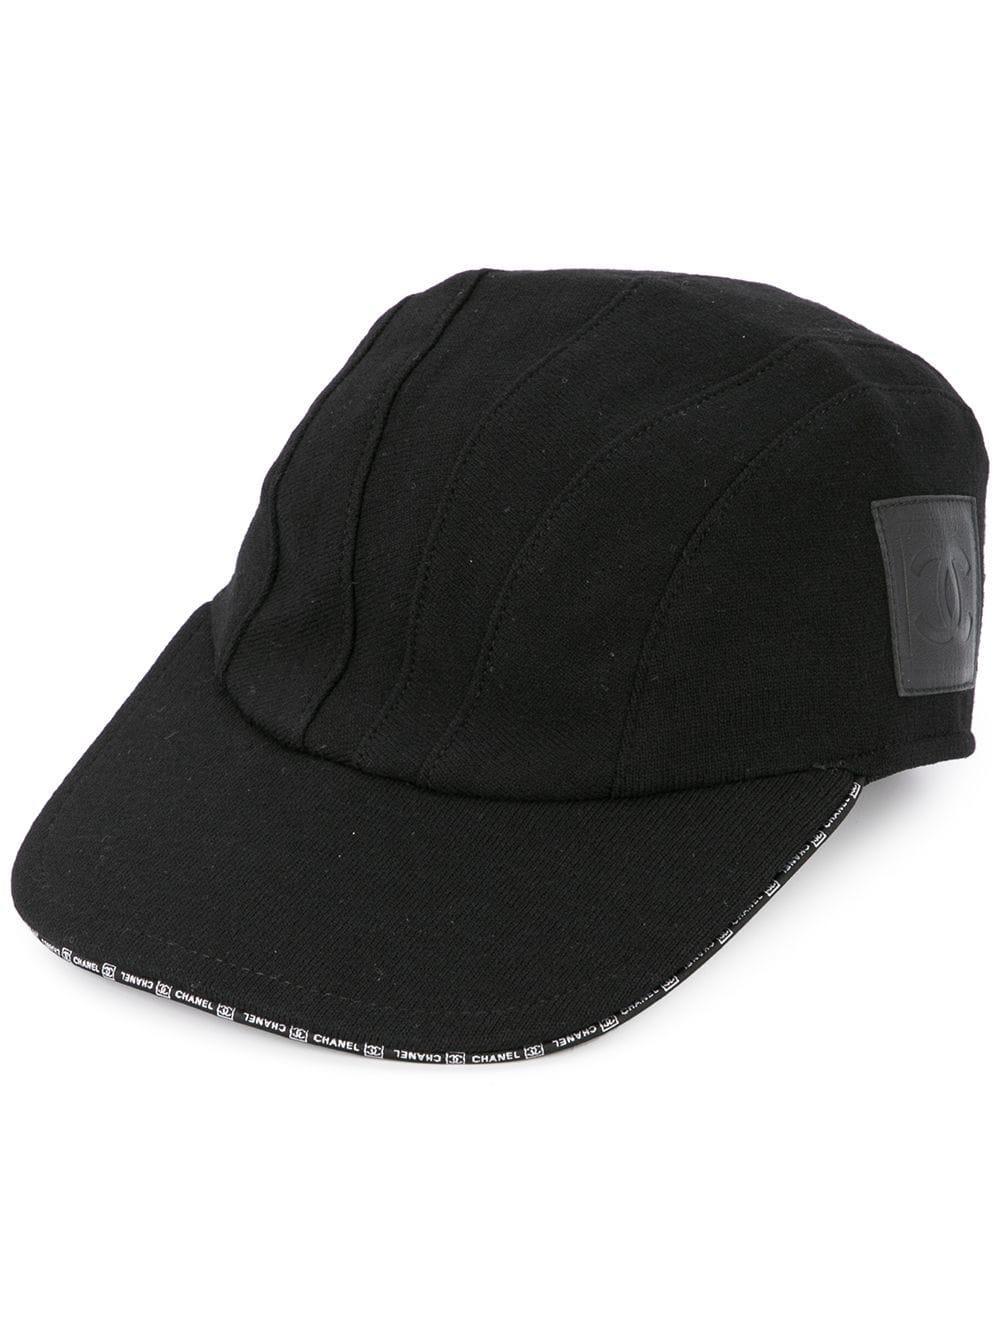 b19a65f6269 Chanel Vintage Cc Cap Hat - Black